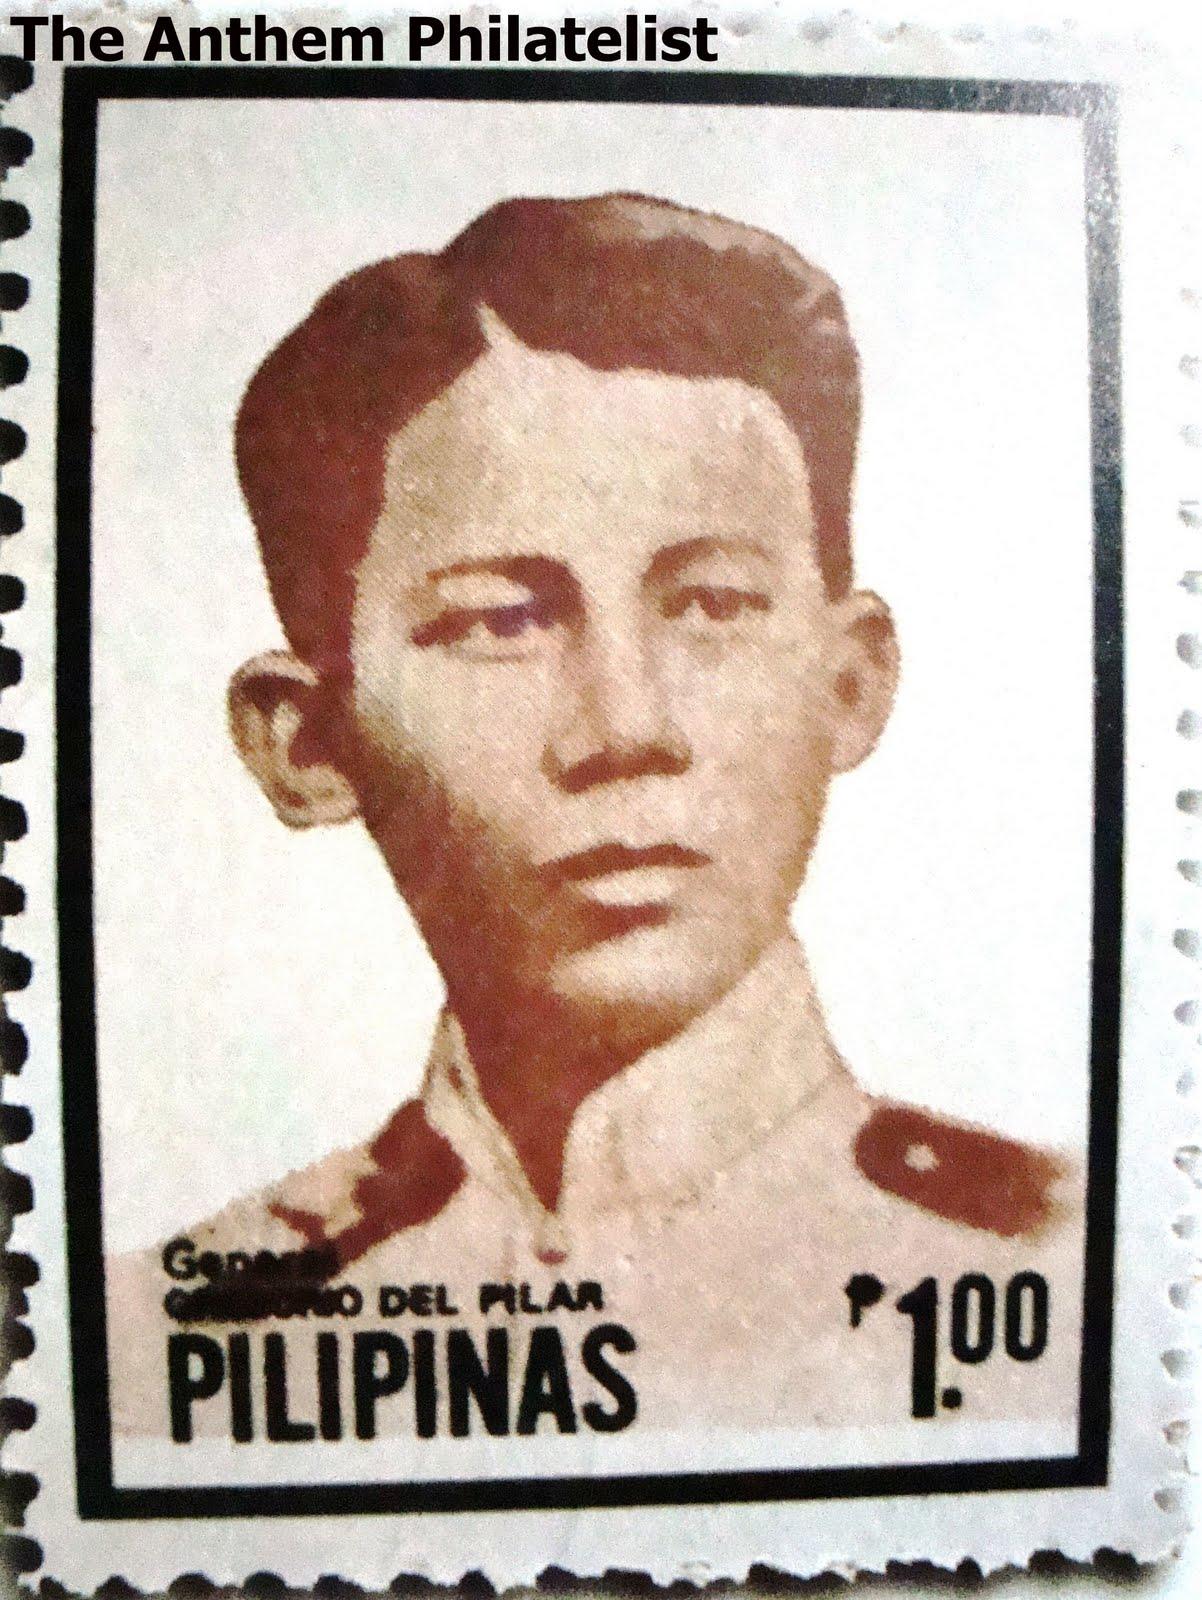 The Anthem Philatelist: Gregorio del Pilar on Stamps